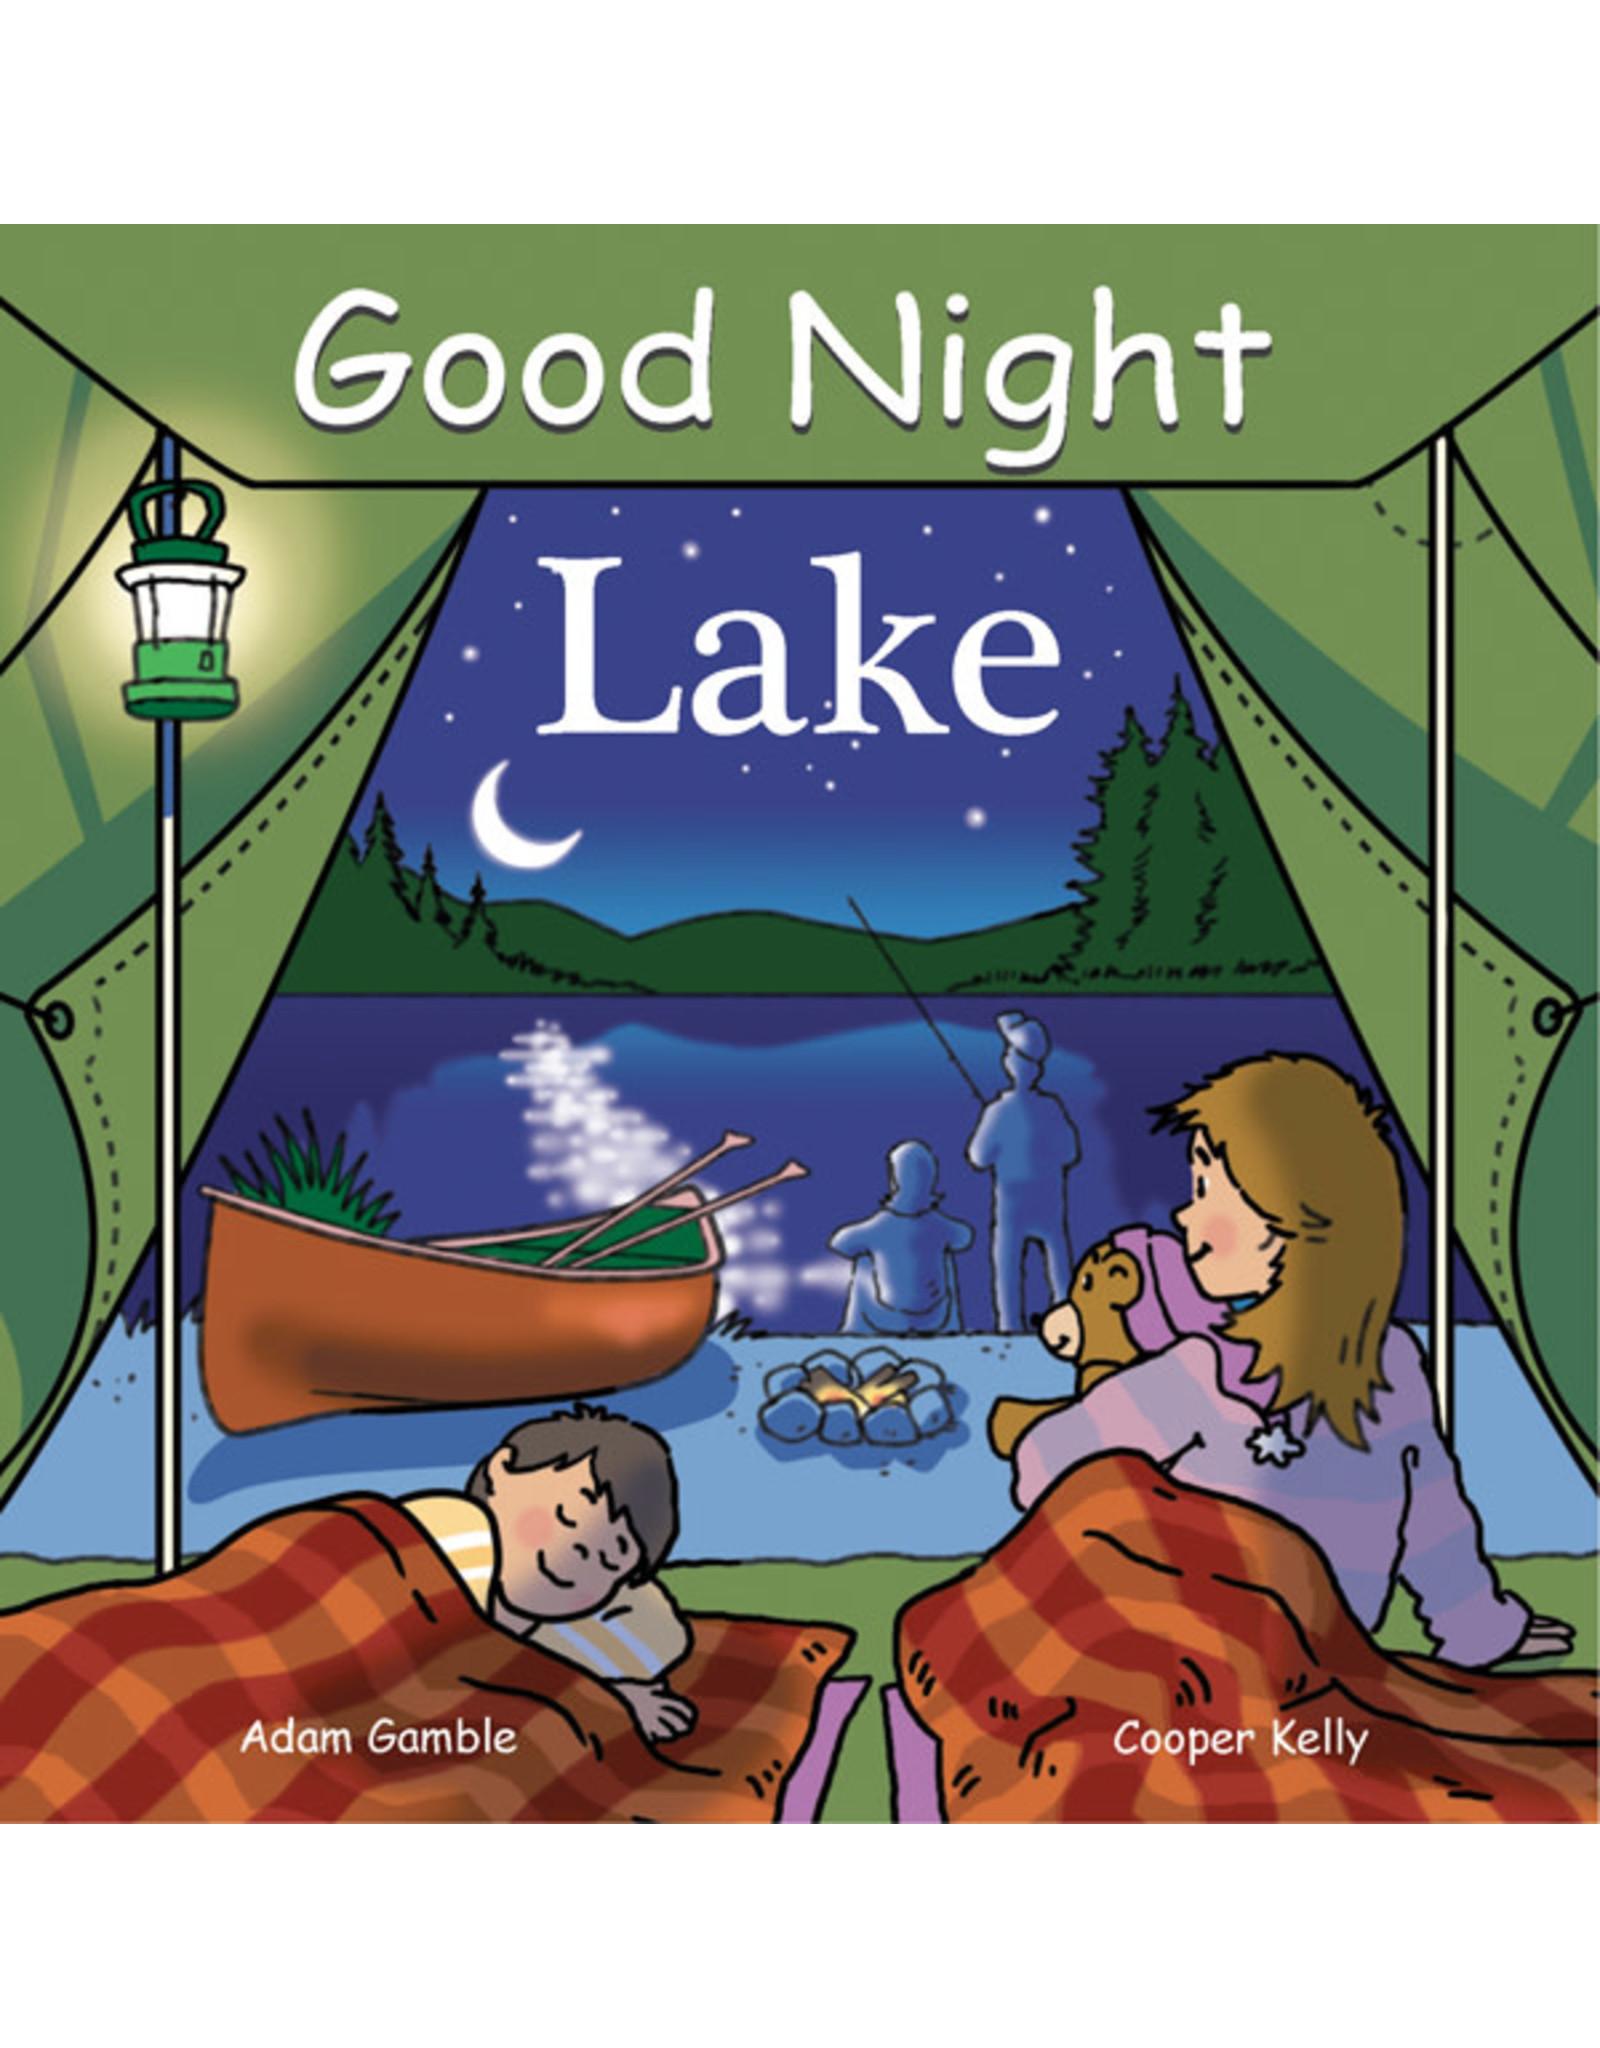 Goodnight Lake Book